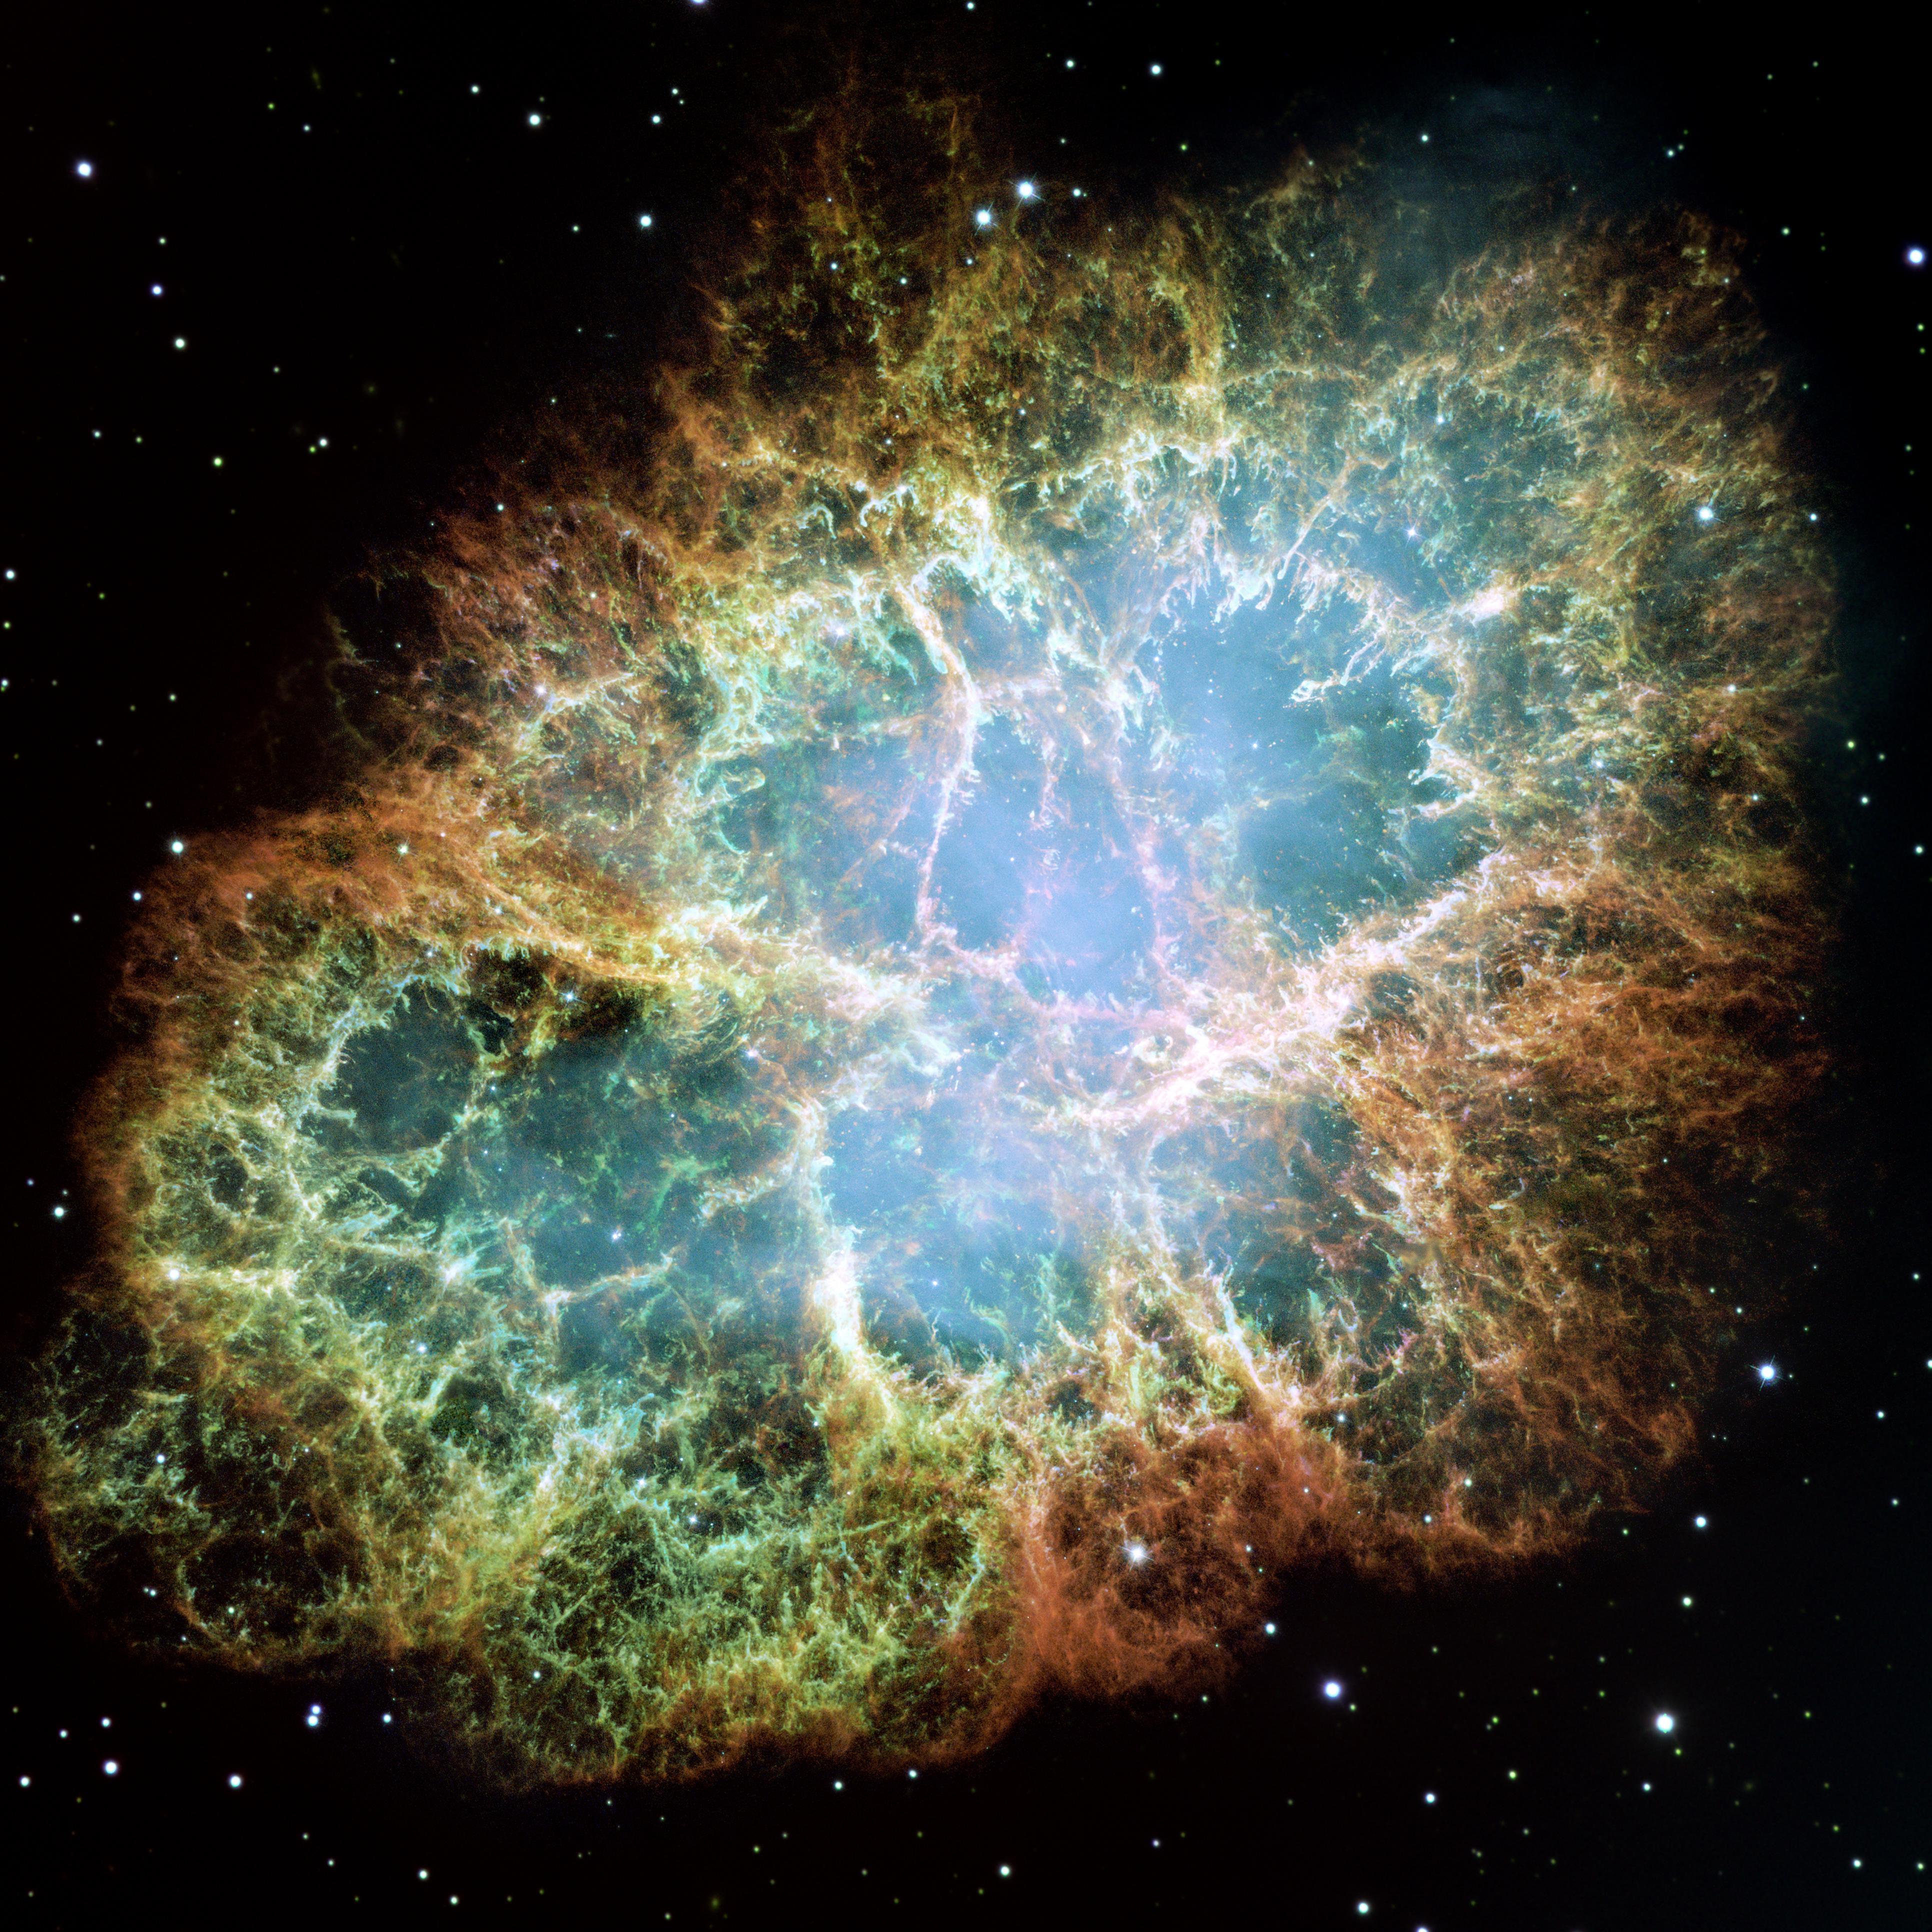 supernova wikipedia org 430453main_crabmosaic_hst_big_full